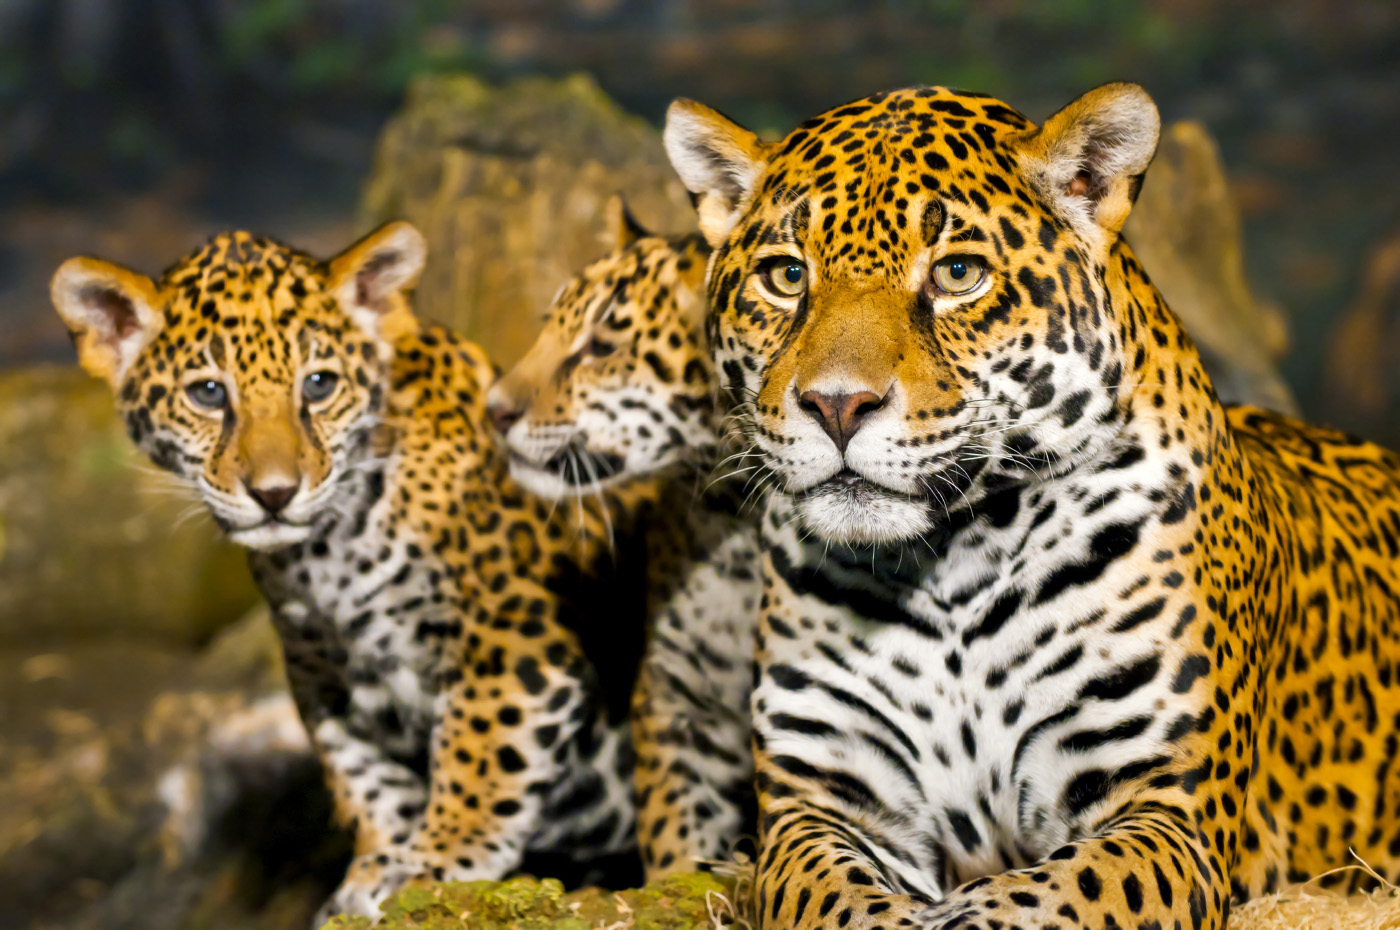 jaguar_lj_3.jpg